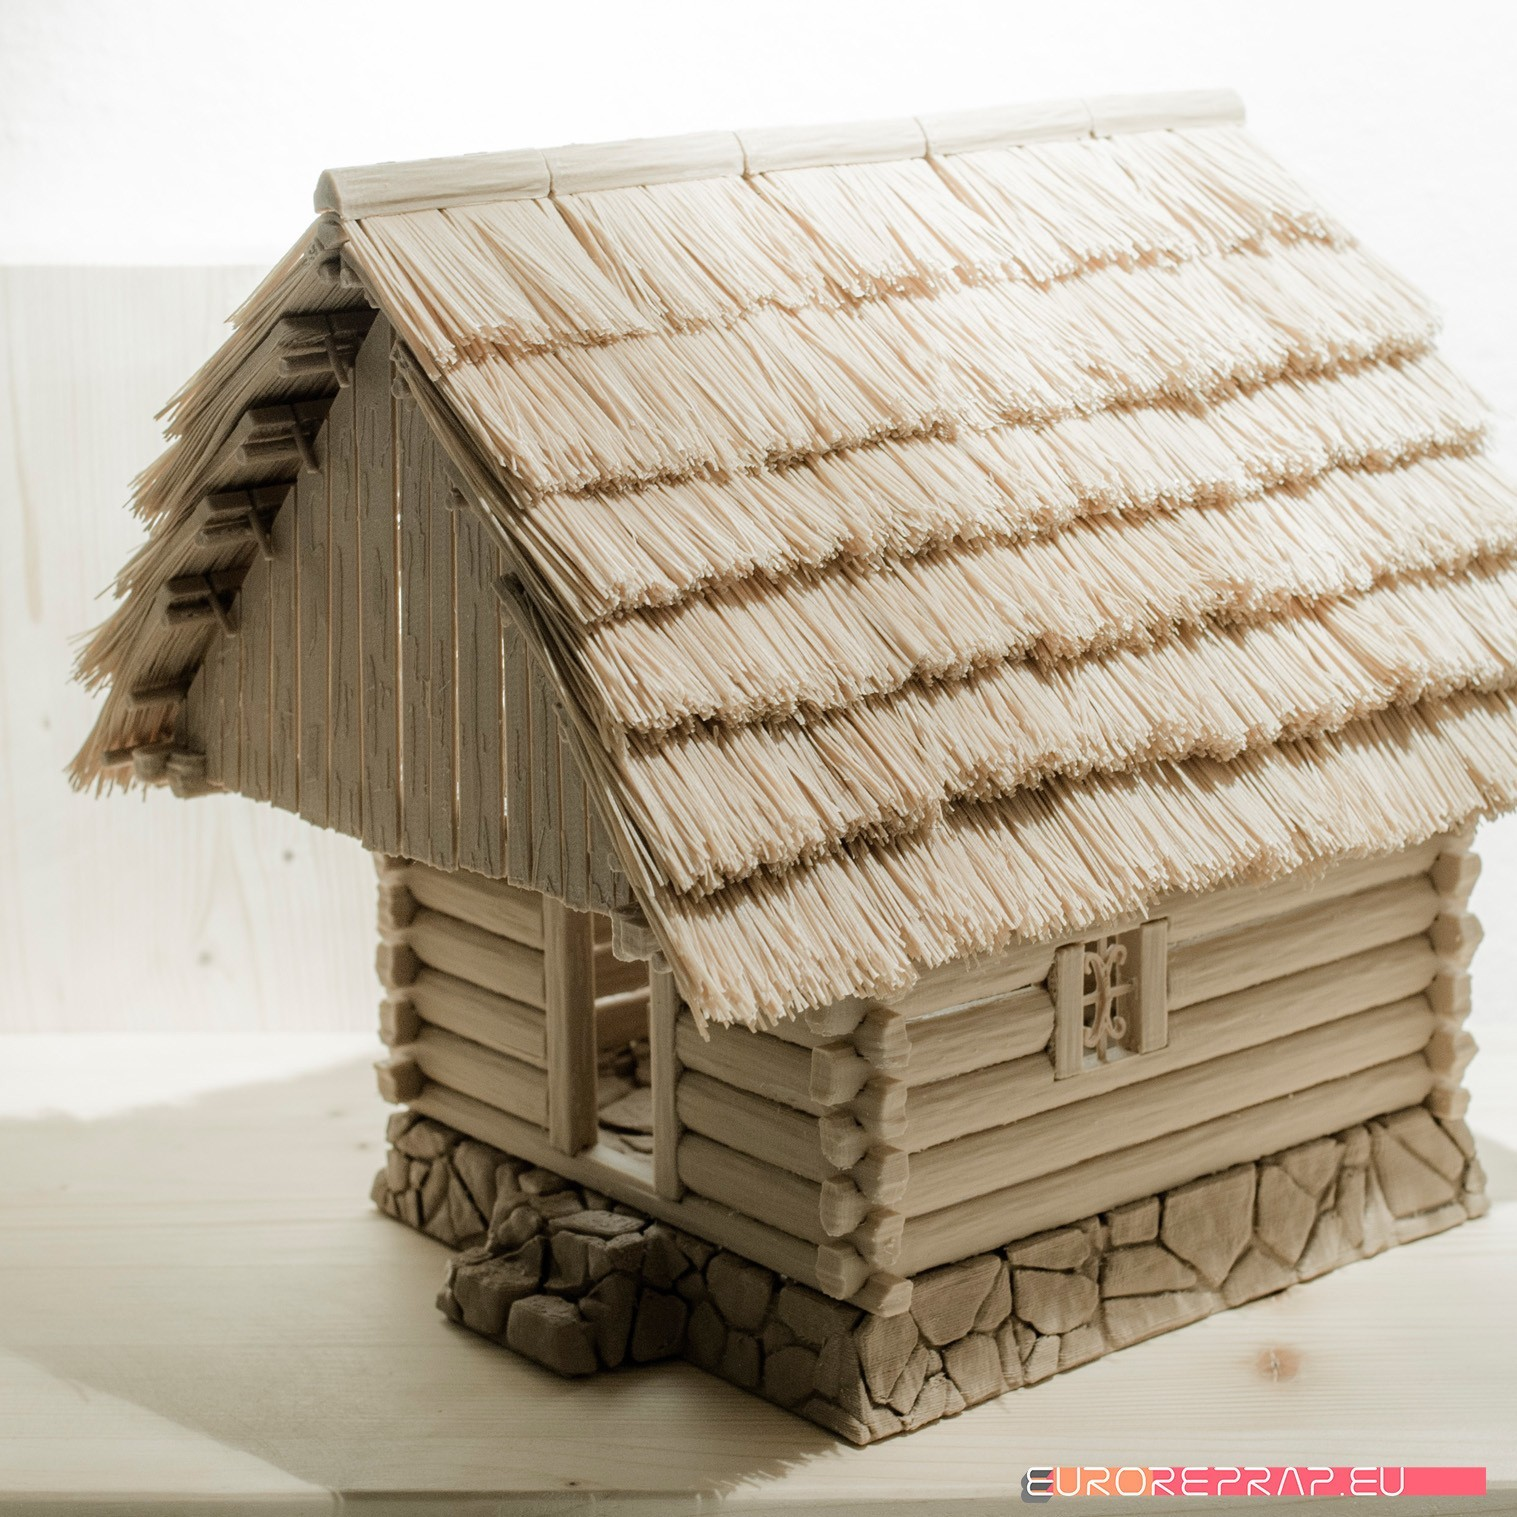 P01.jpg Download STL file 3D printed house - log cabin - cottage • 3D printable template, euroreprap_eu